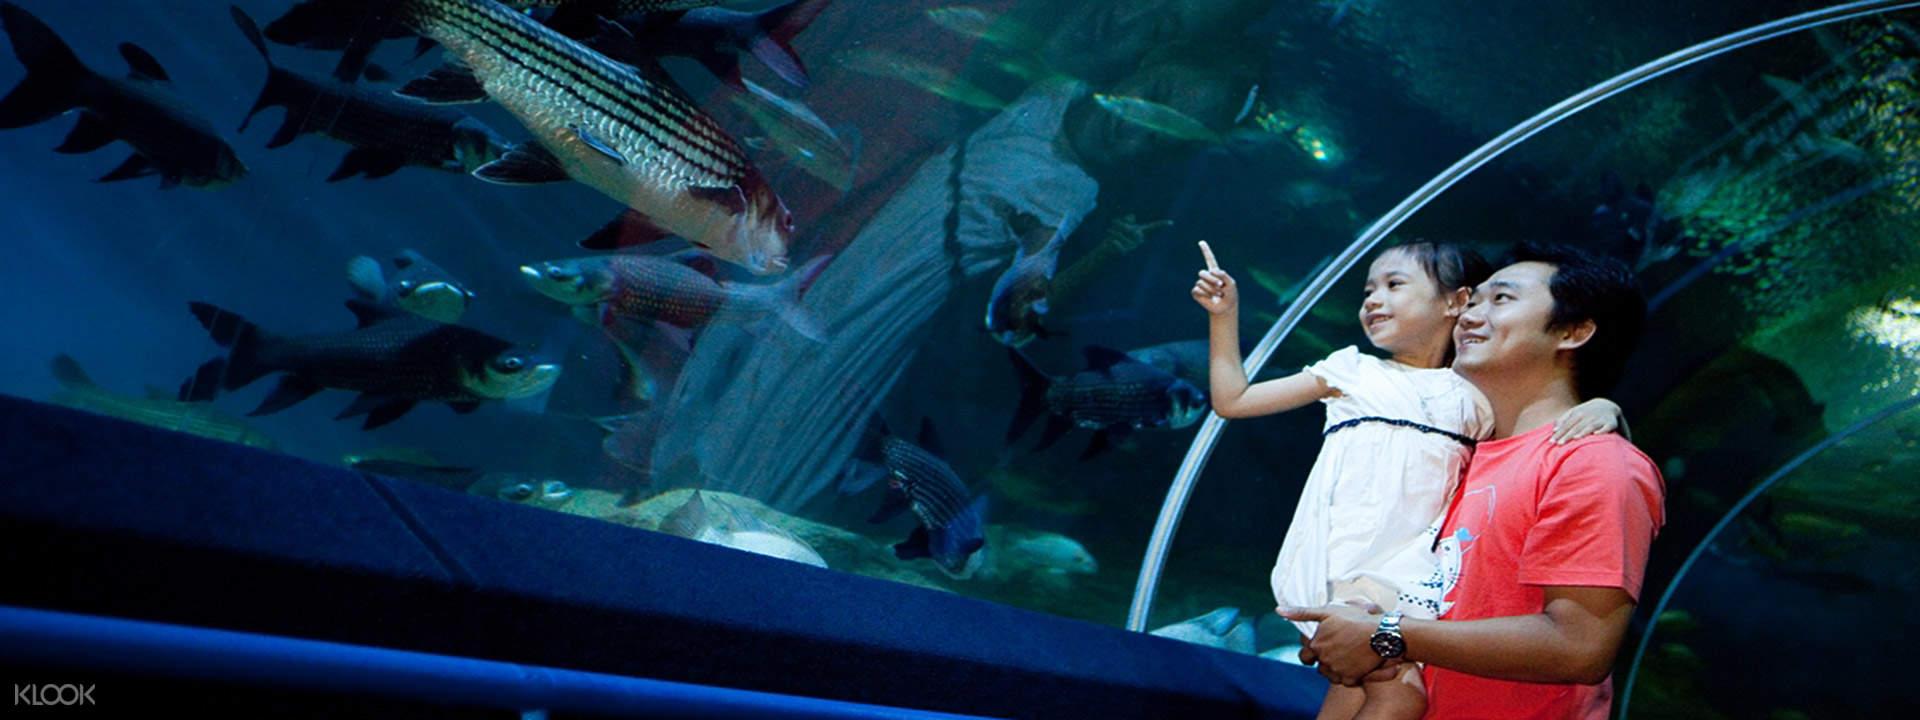 Underwater World Pattaya Klook Thailand Et Ticket Sea Life Ocean Aquarium Only Adult Log In